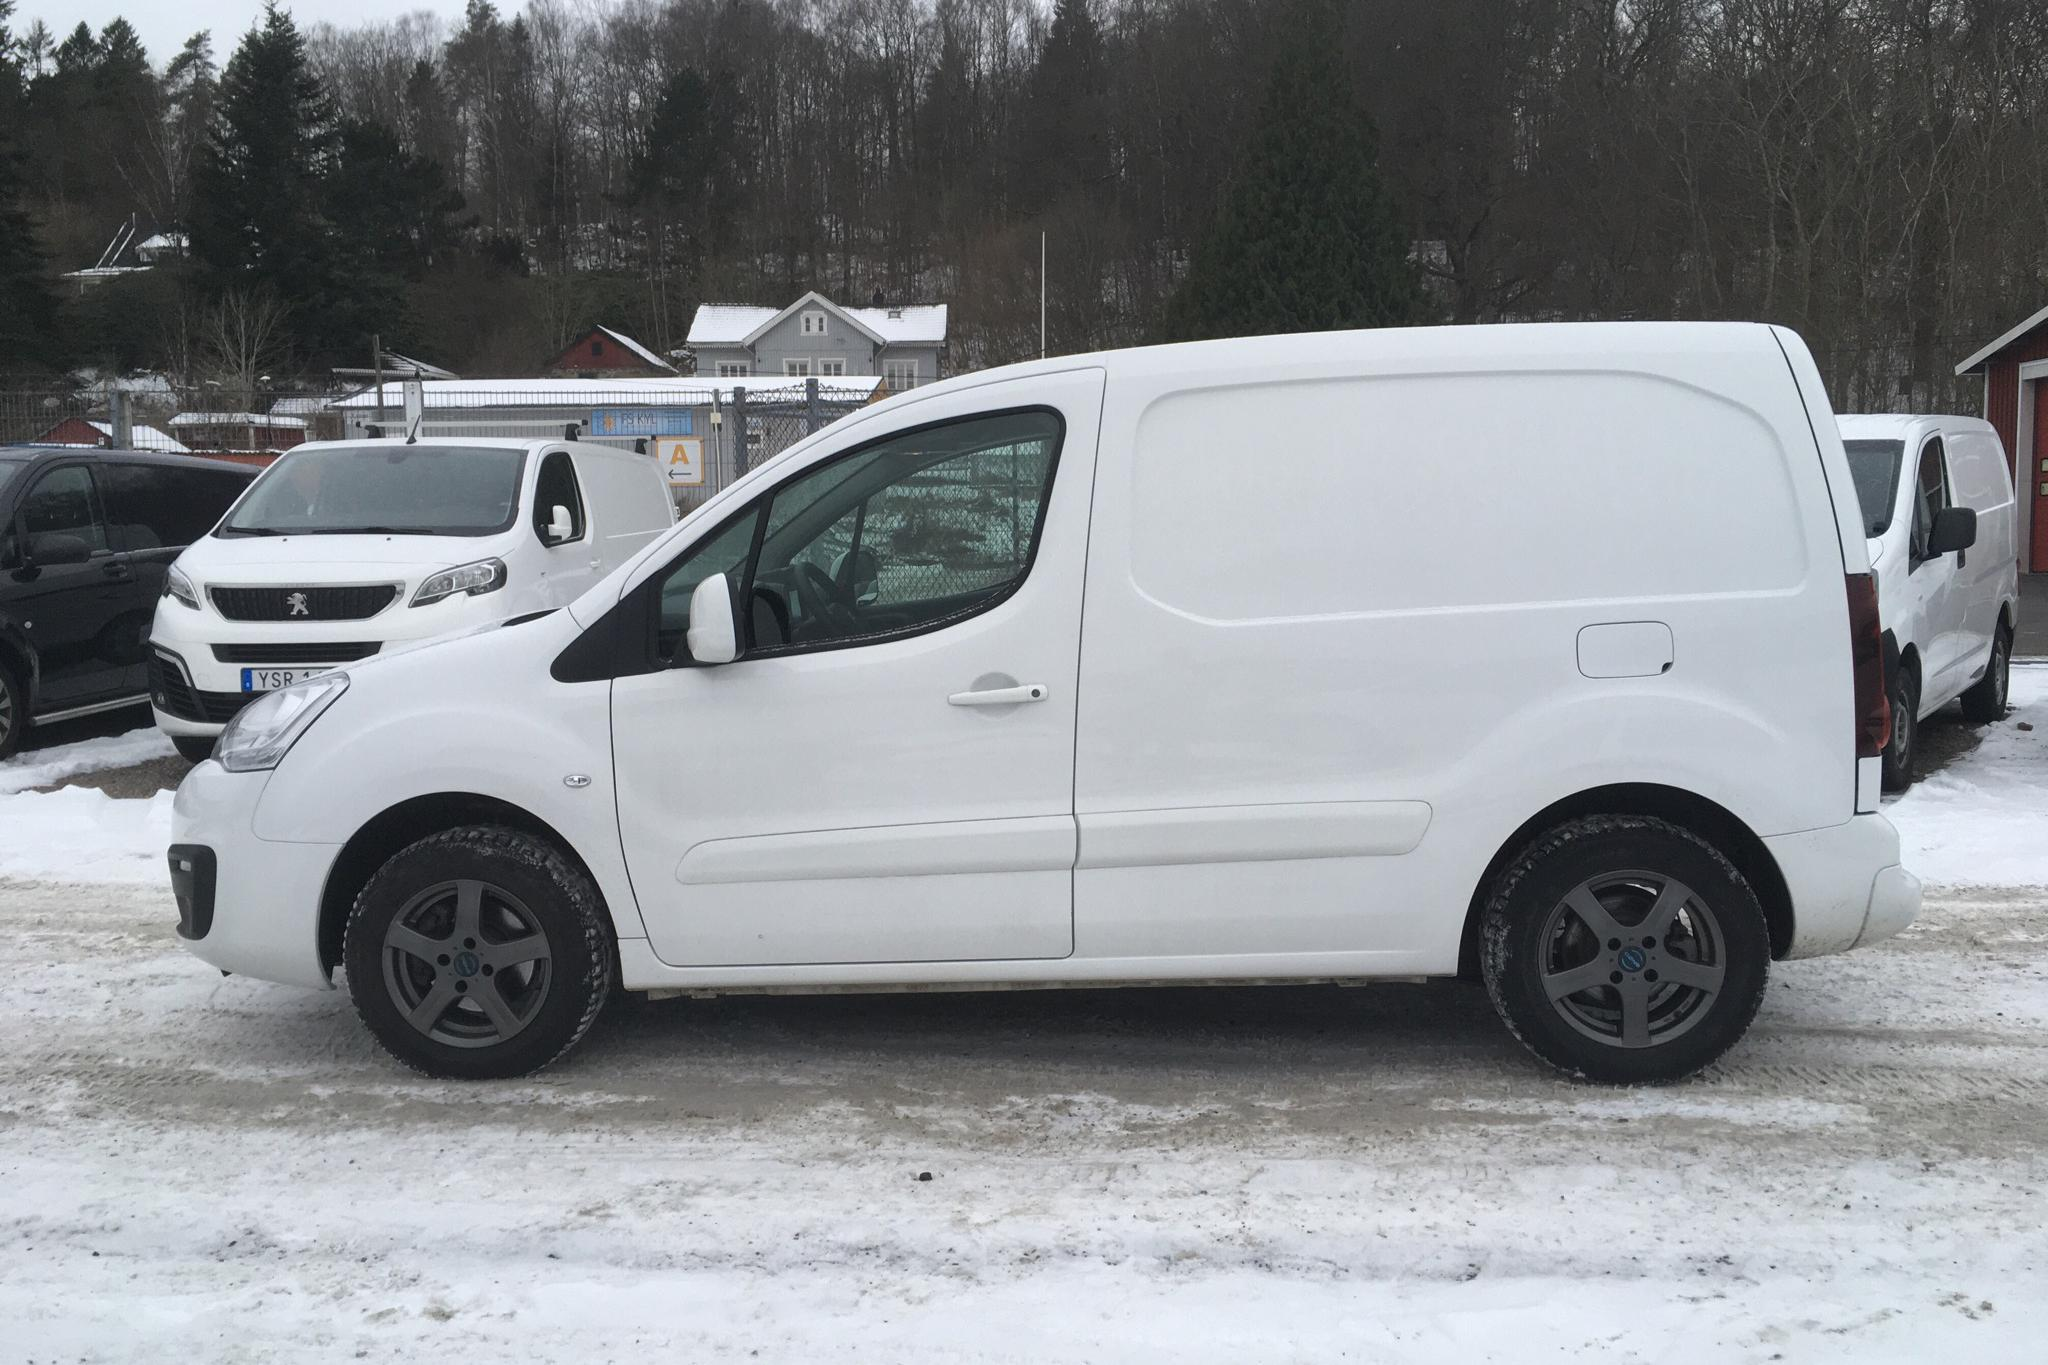 Citroen Berlingo 1.6 BlueHDi Skåp (100hk) - 28 310 km - Manual - white - 2019